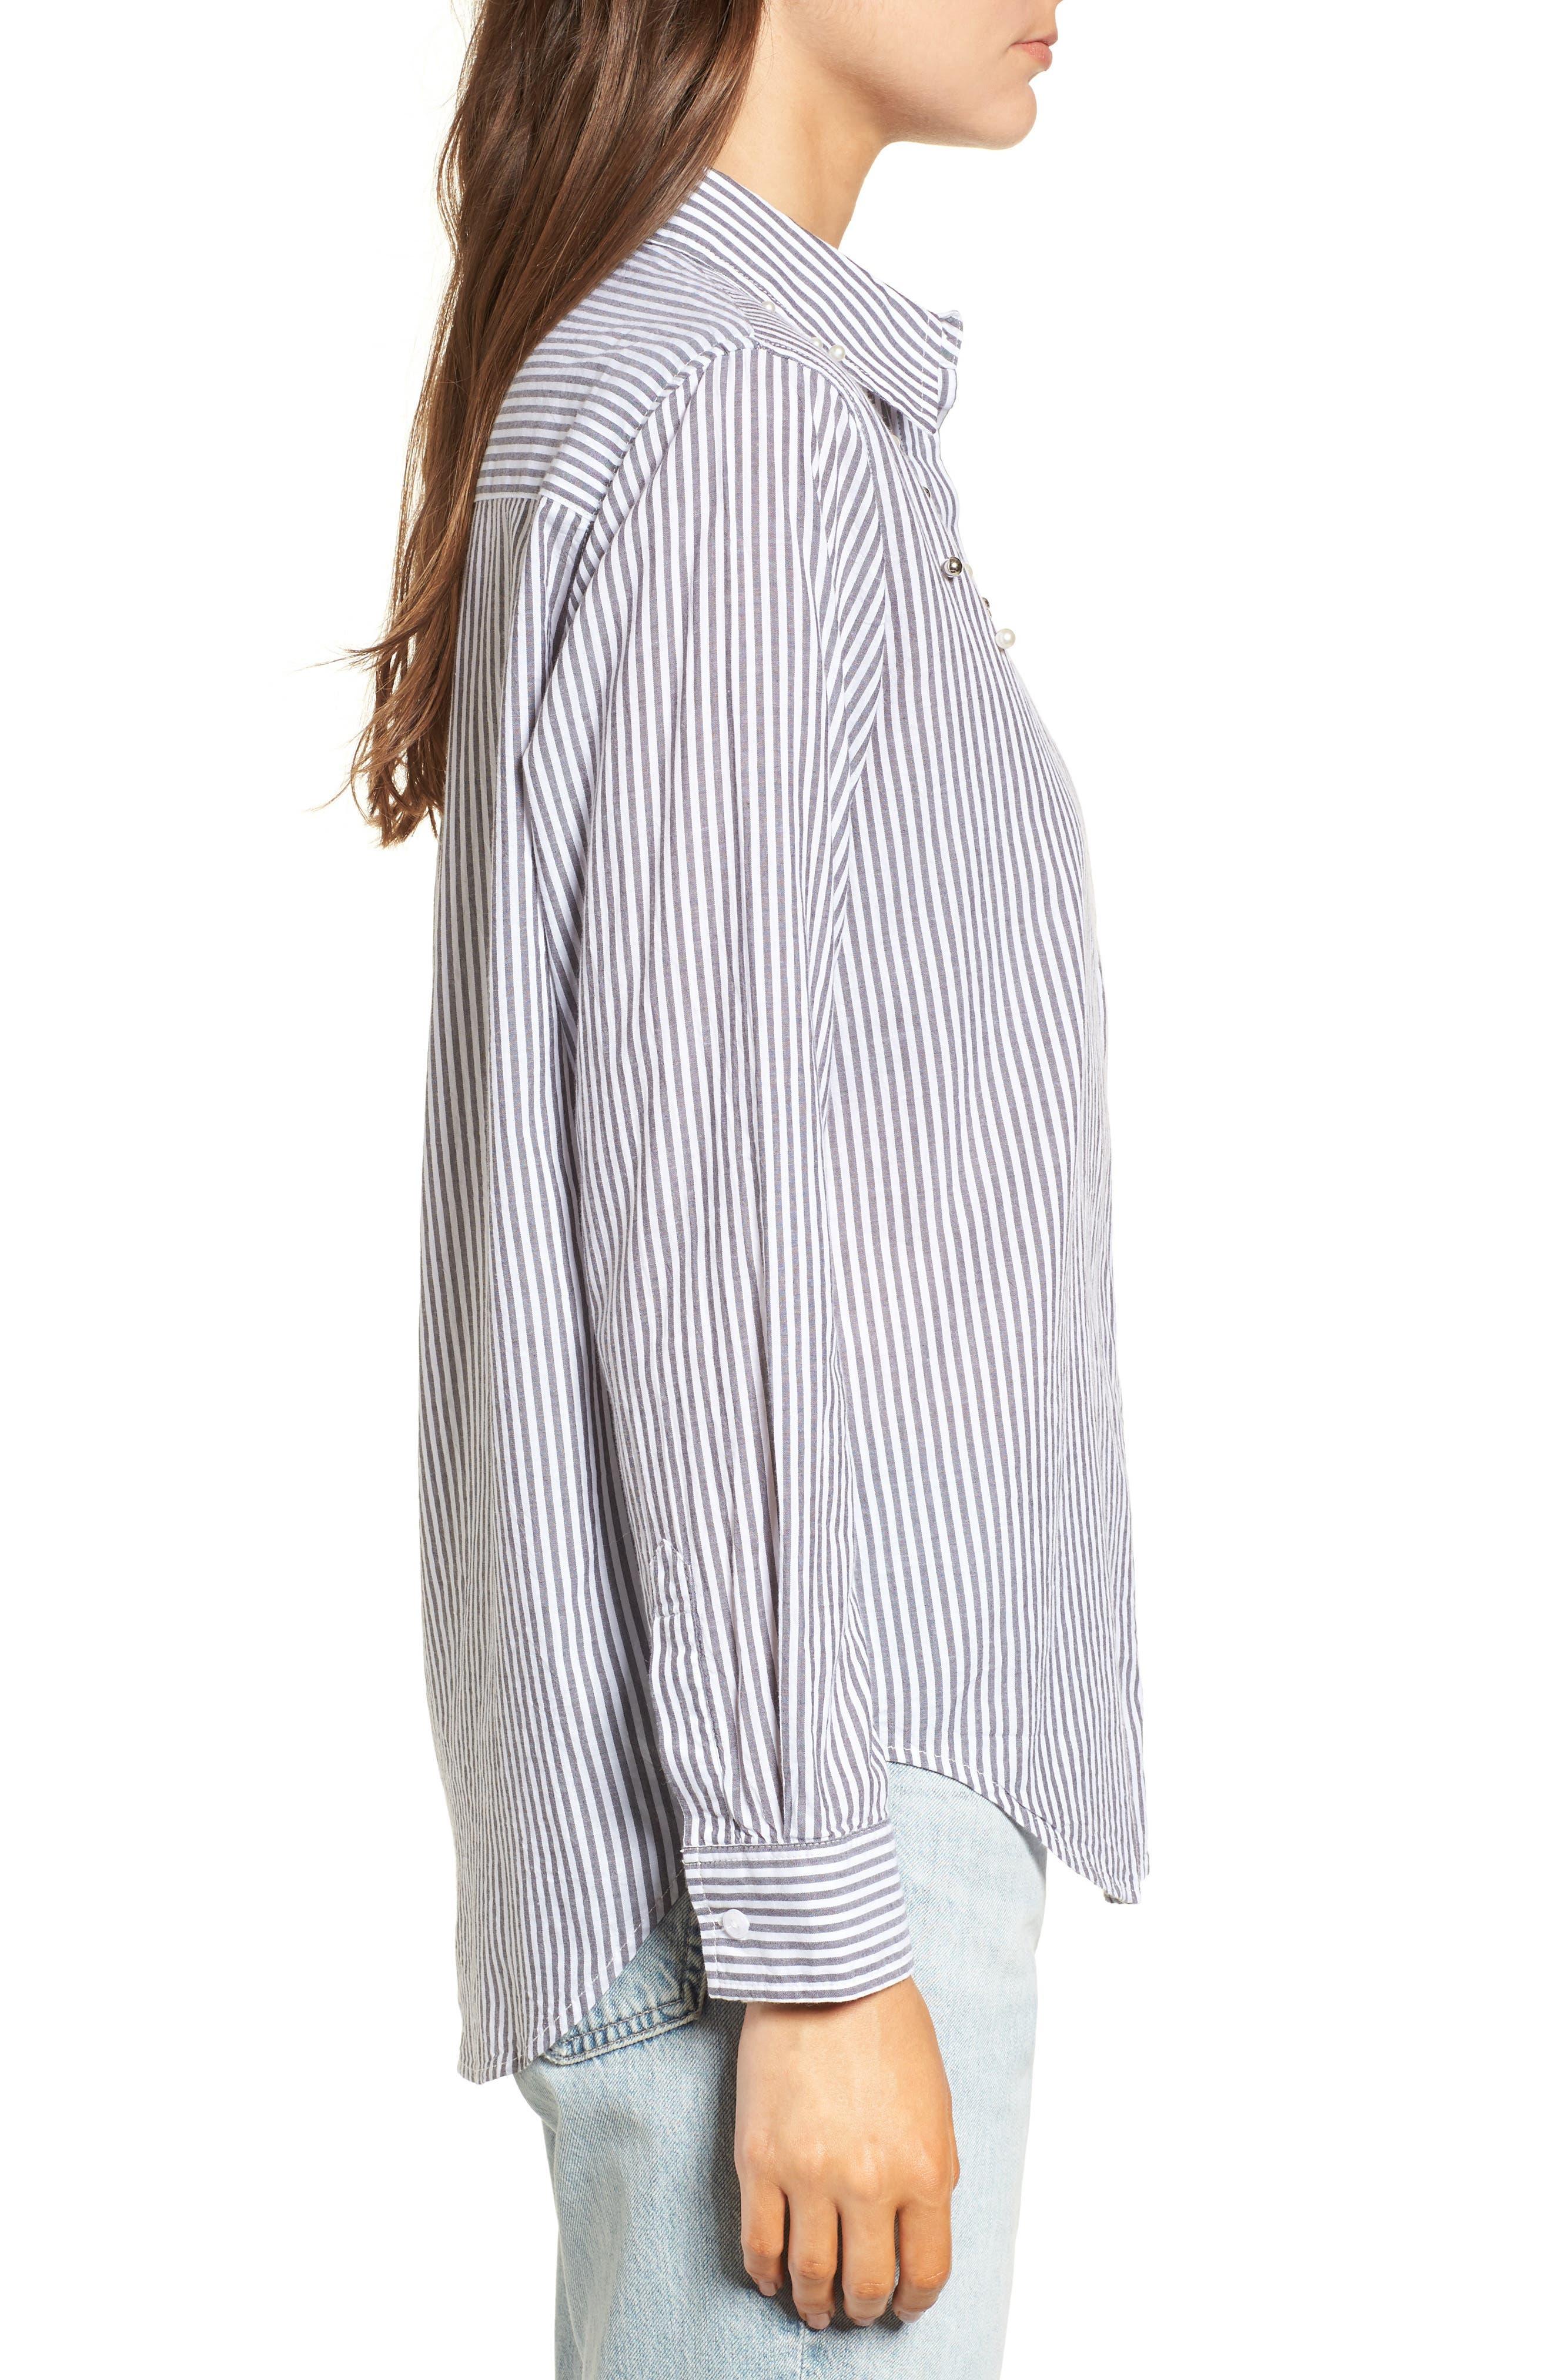 Taylor Embellished Shirt,                             Alternate thumbnail 3, color,                             Florence Stripe Studded Pearls